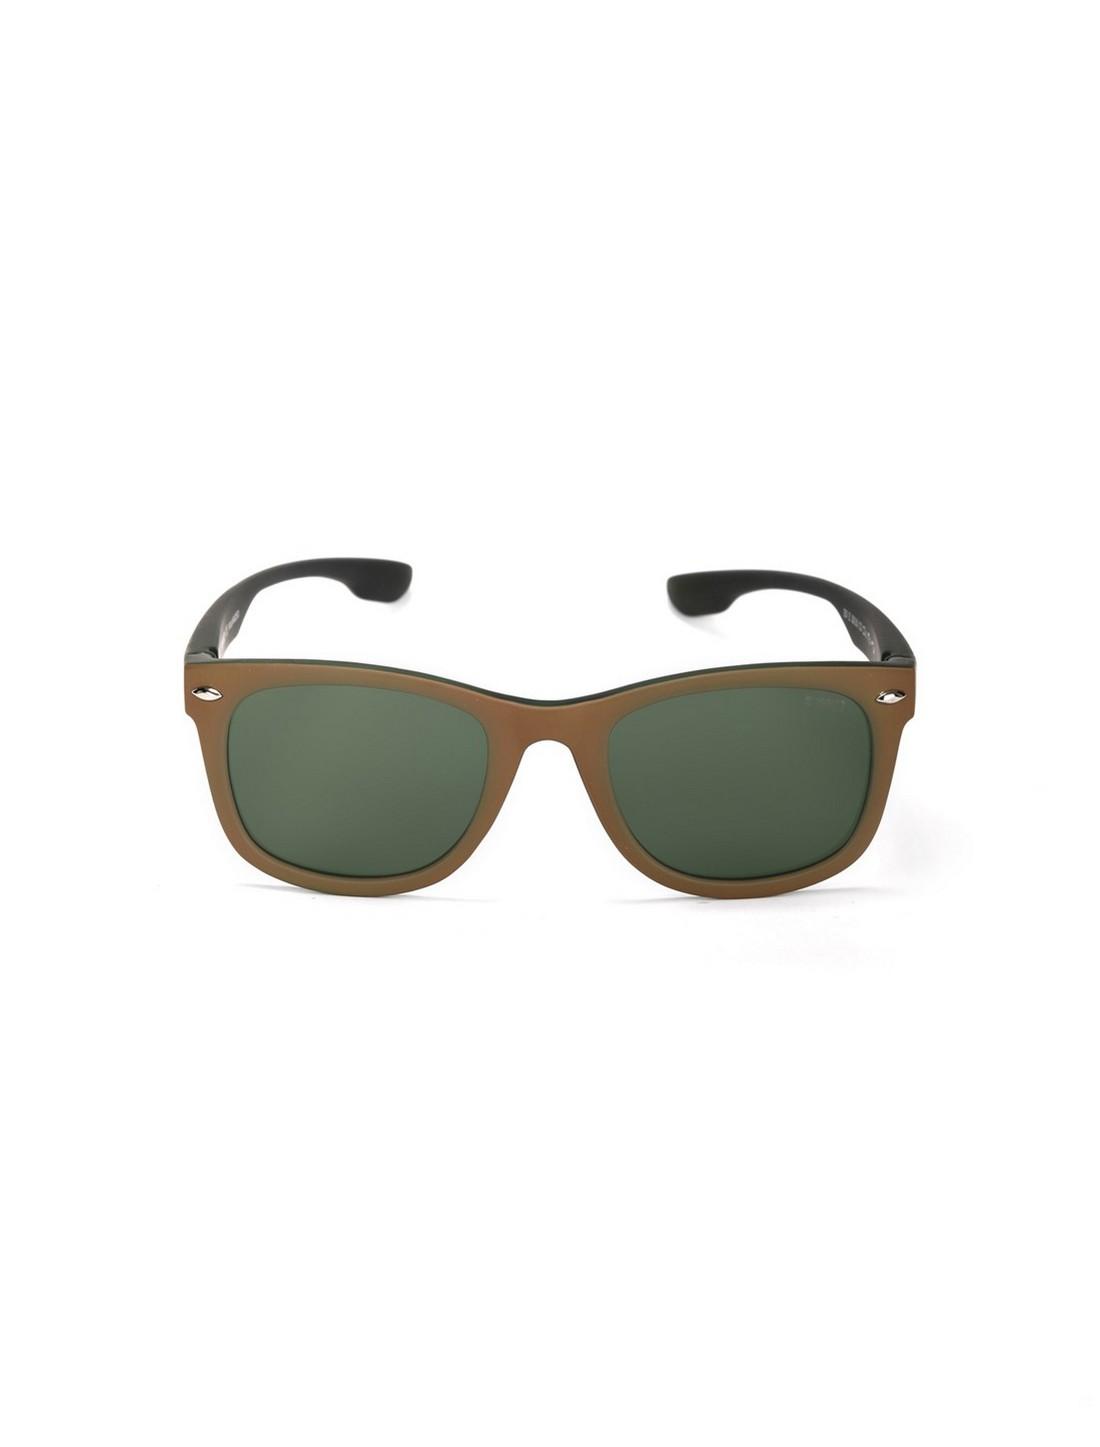 ENRICO | ENRICO Nudo UV Protected Wayfarer Sunglasses for Men ( Lens - Green | Frame - Brown )